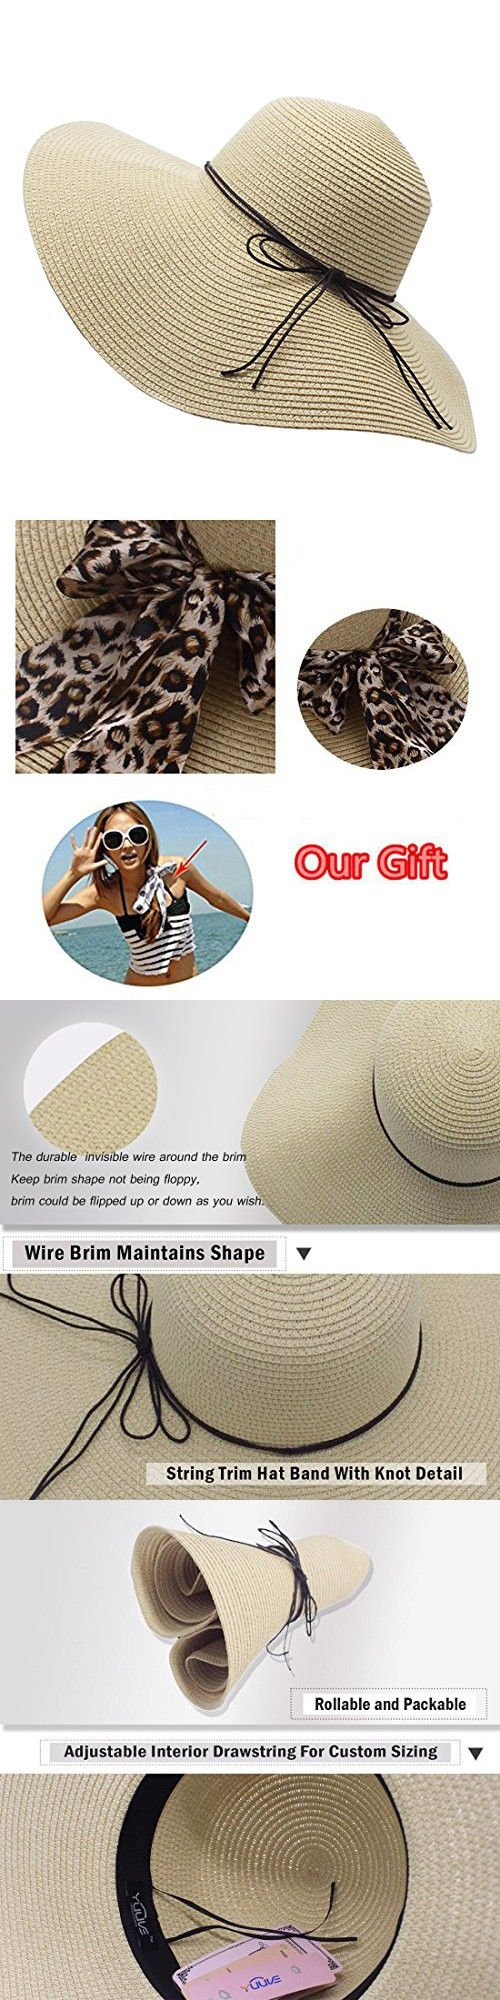 YUUVE Ladies Summer Straw Hat Fedora Floppy Sun Hat Large Wide Brim Beach  Cap For Women(Free Ribbon Gift) 3e4597491e6e